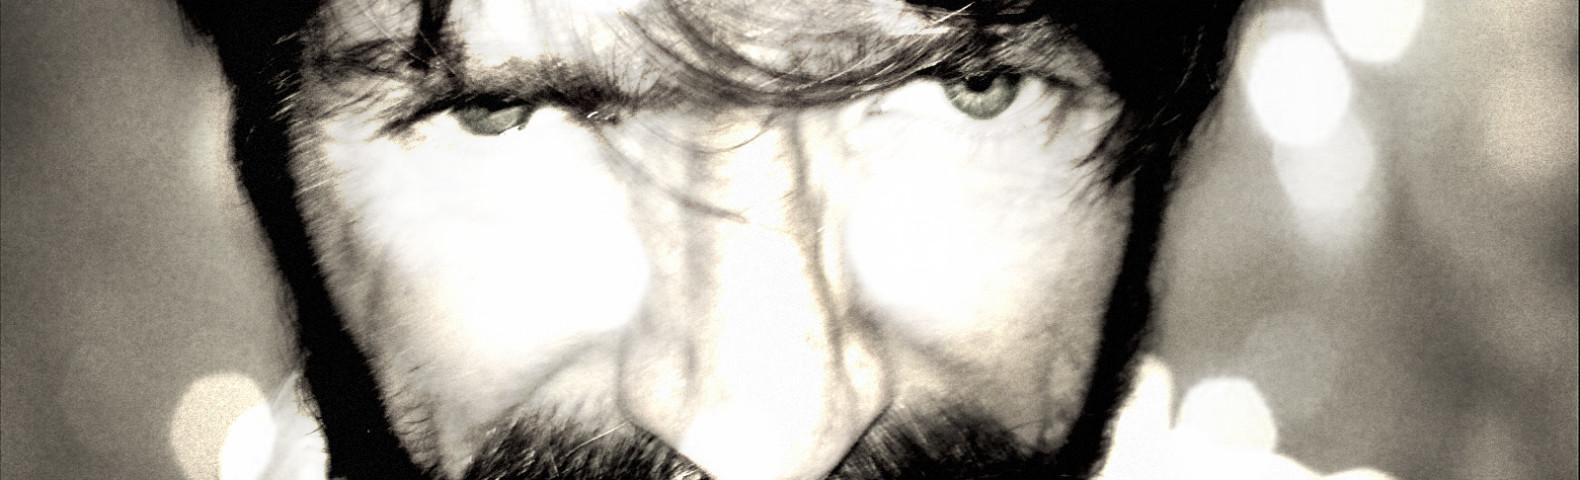 Brian Dunaway Bright Eyes